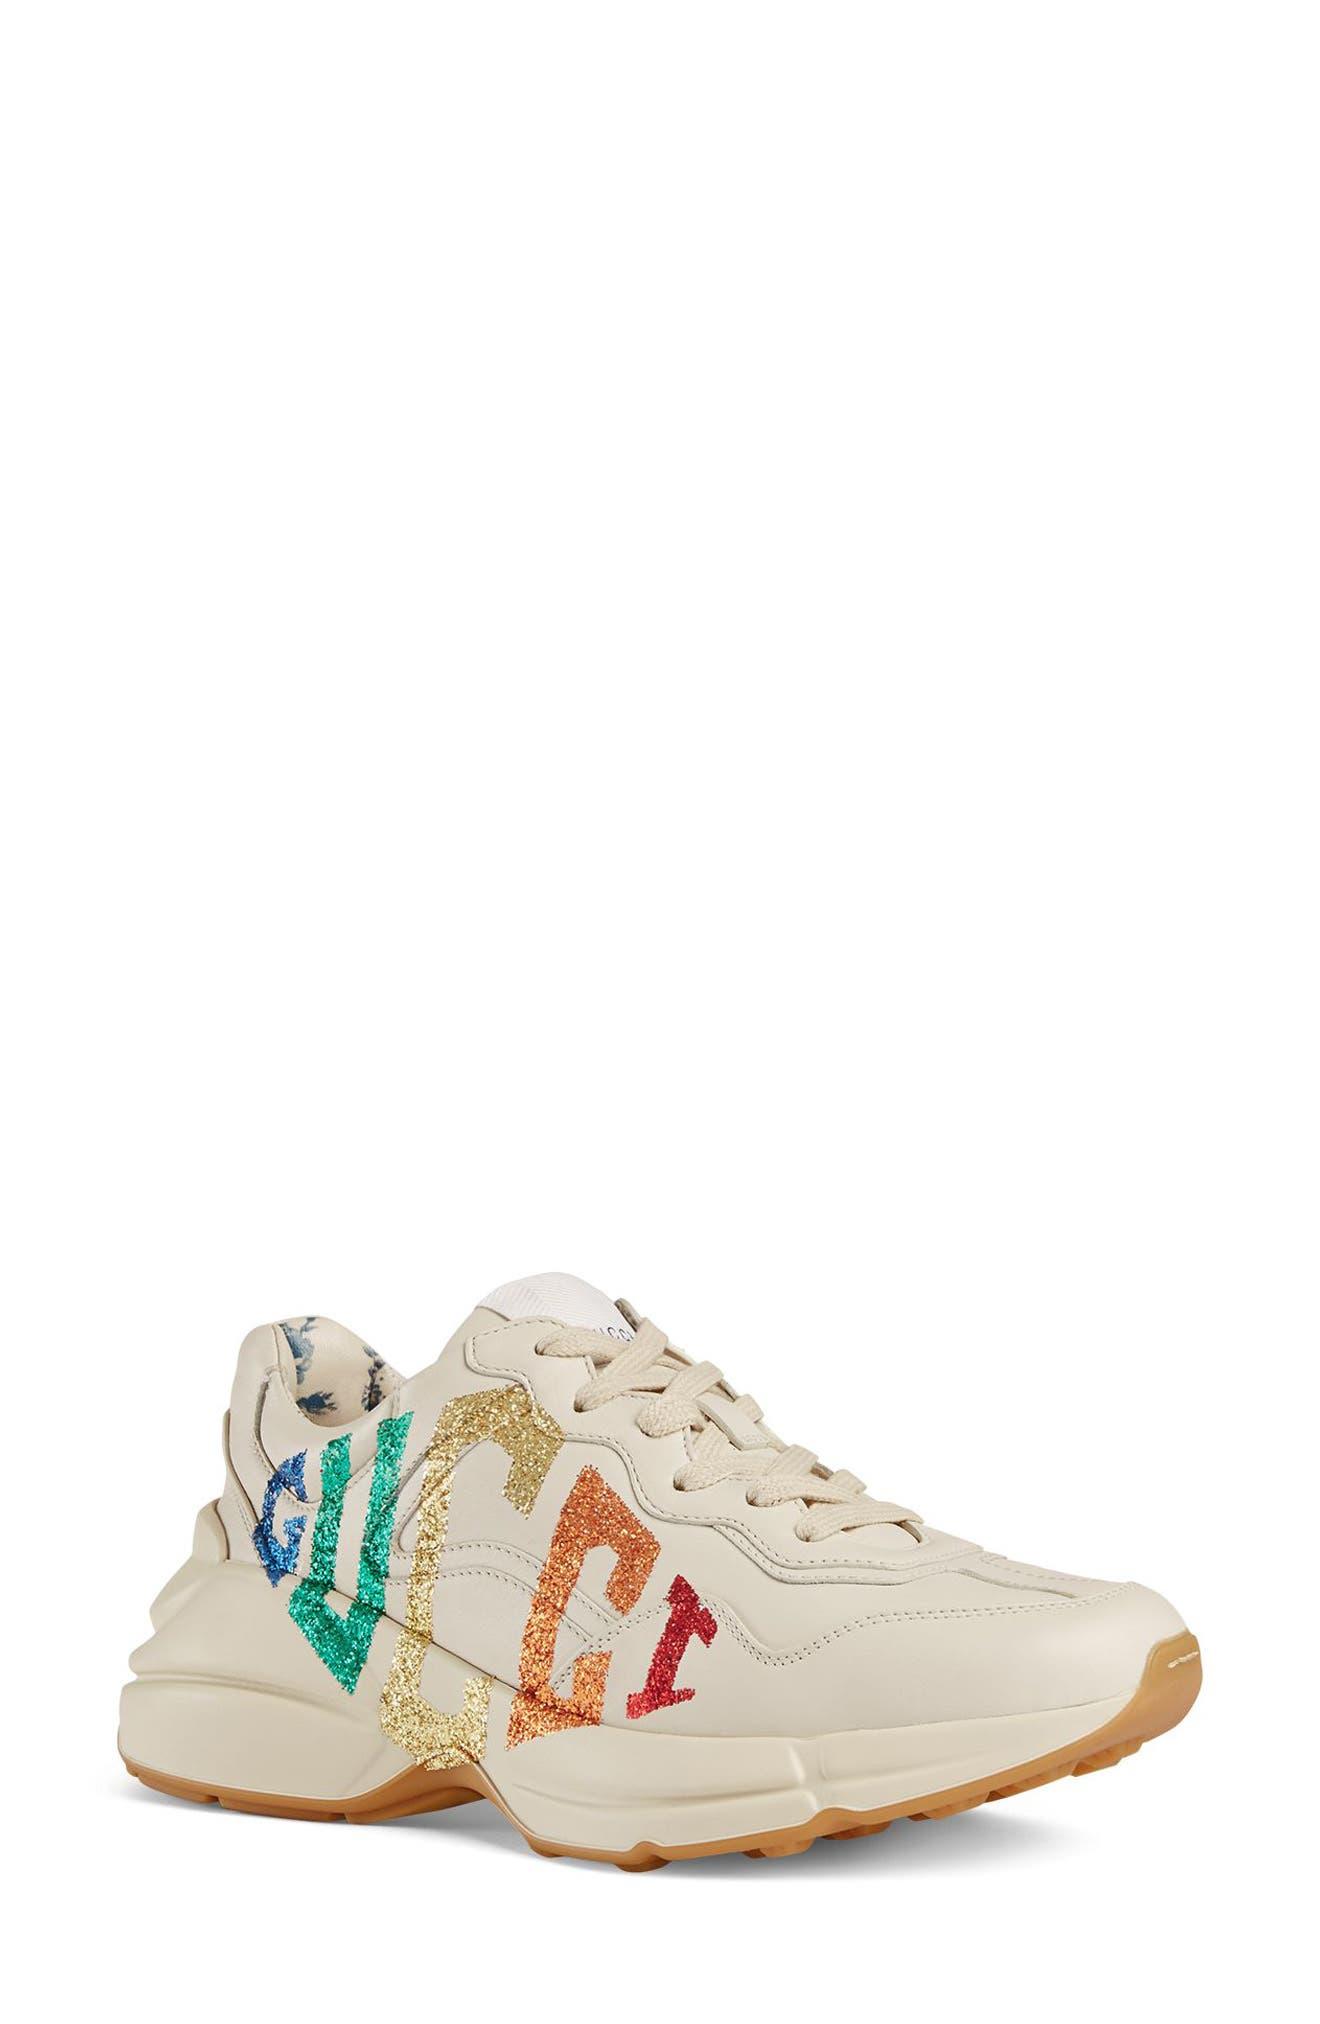 Gucci Rhyton Rainbow Logo Sneaker - White